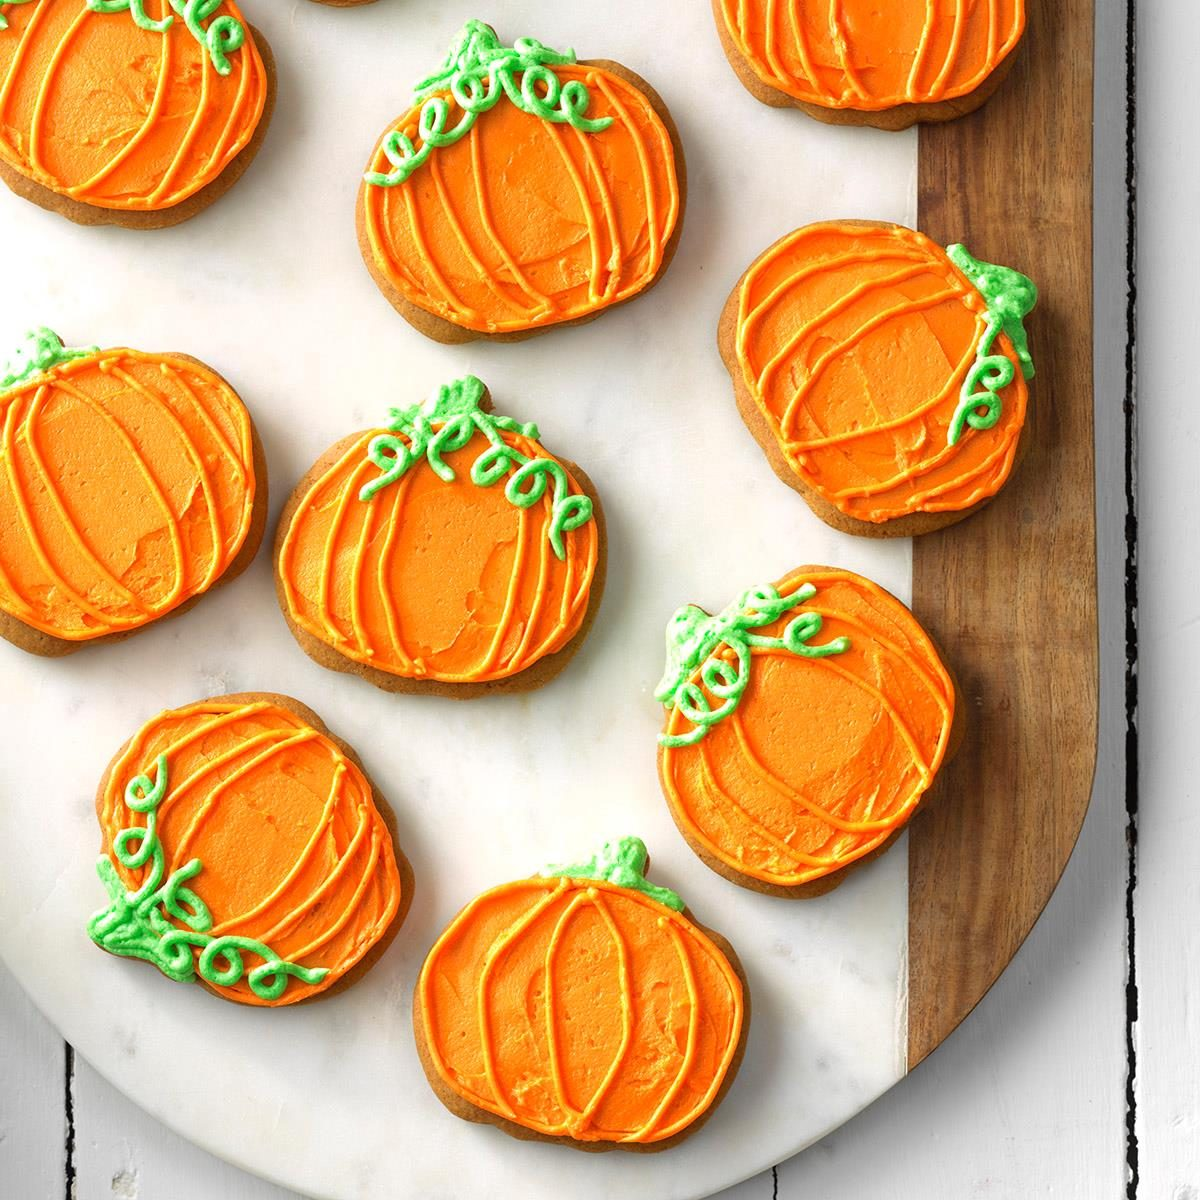 Our Favorite Pumpkin Spice Recipes